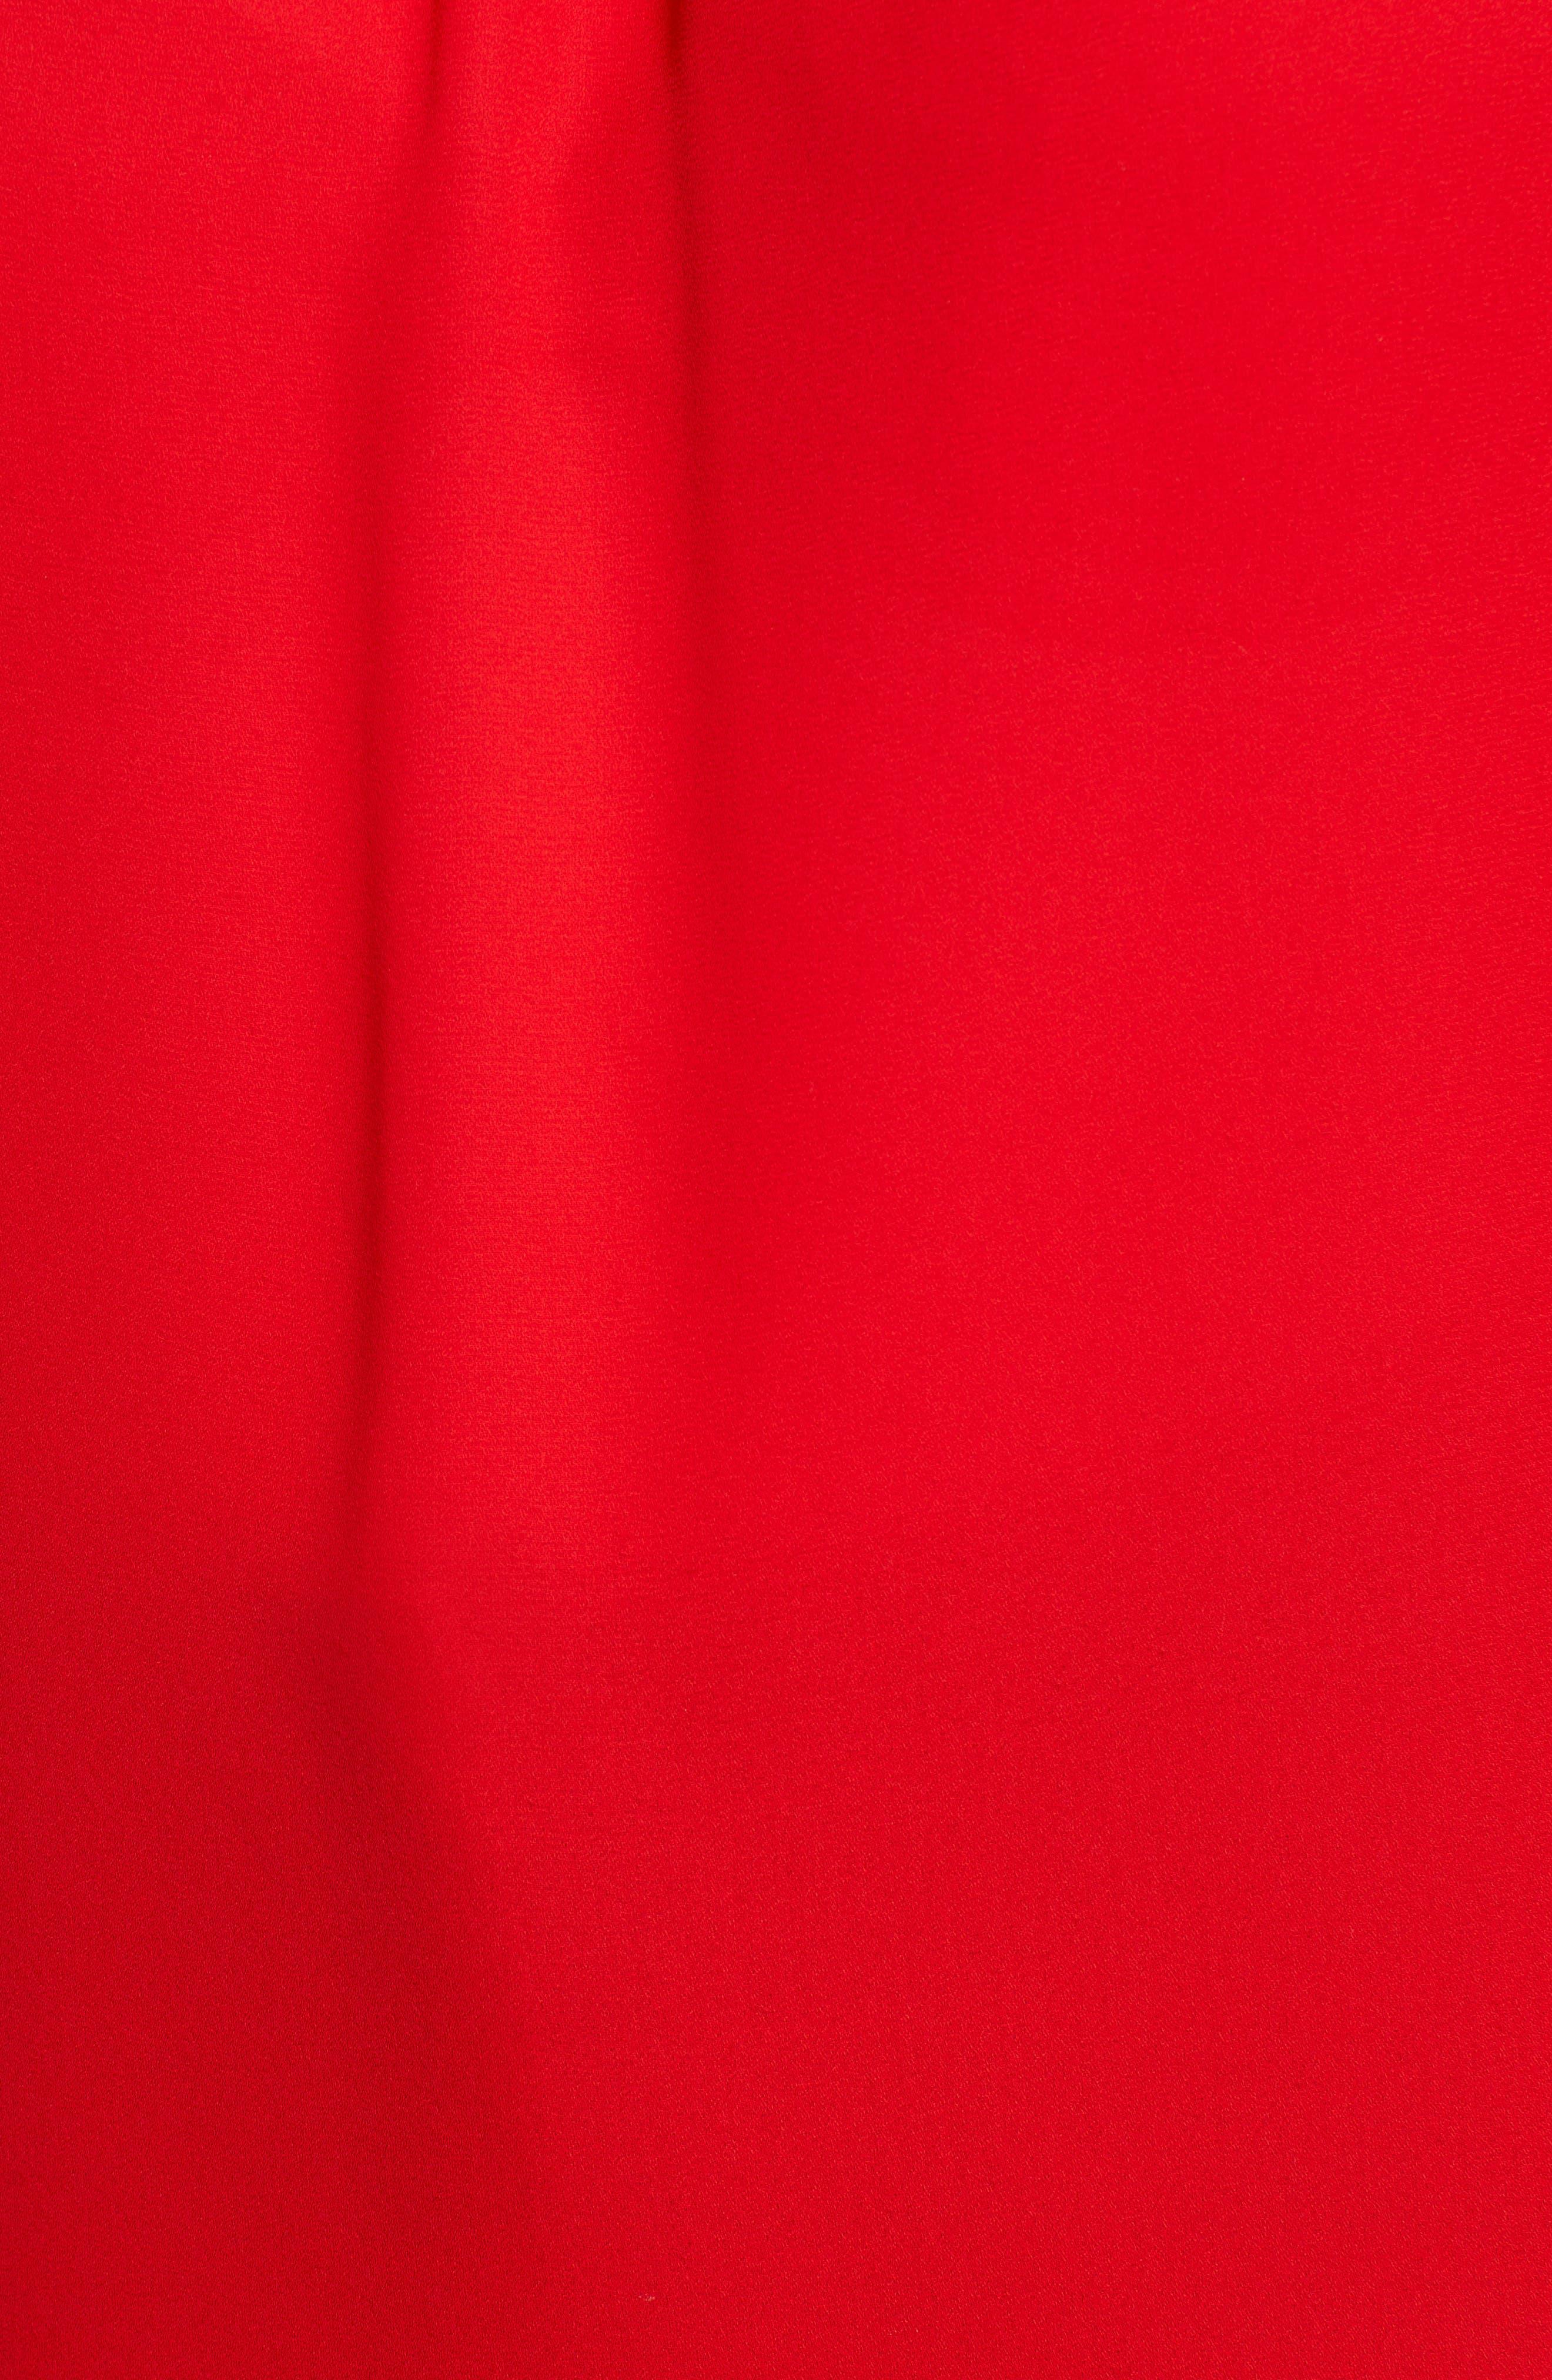 Smocked Neck Blouse,                             Alternate thumbnail 6, color,                             Radiant Red